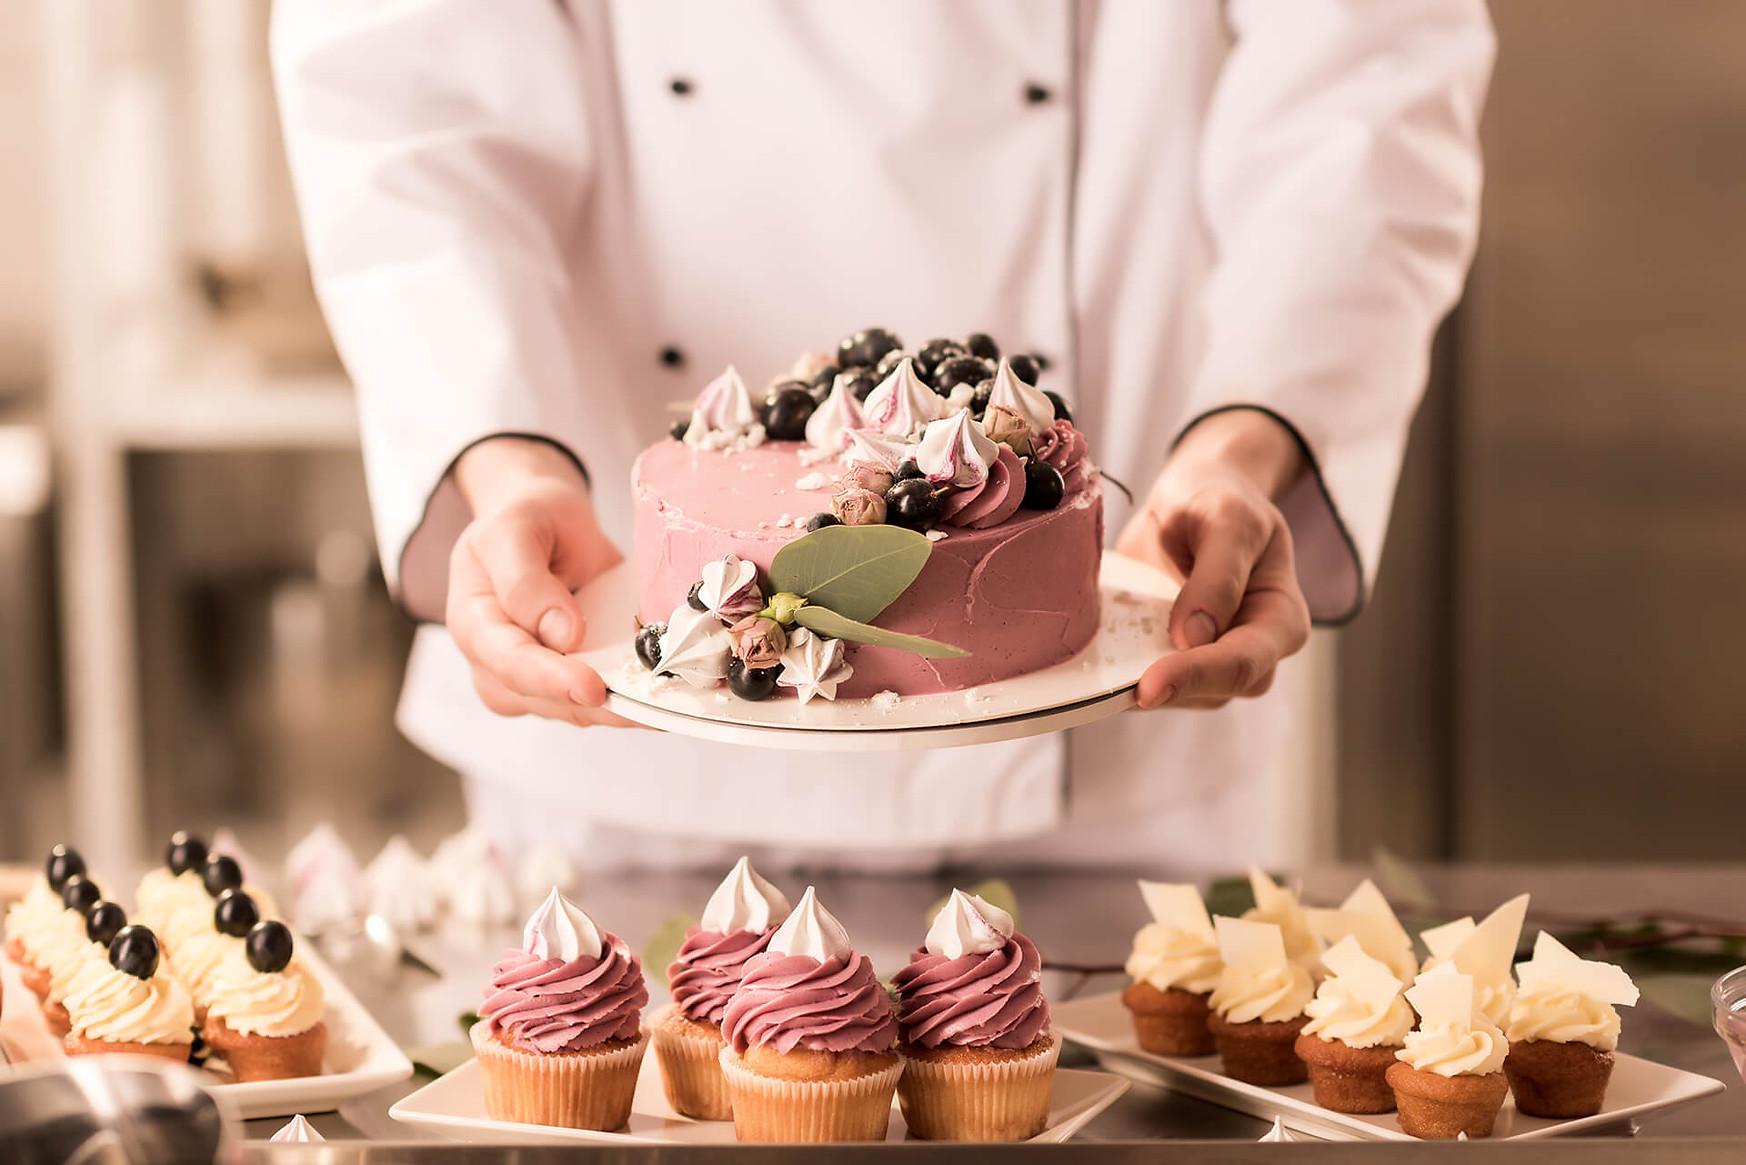 A-Chef-Presenting-a-Cake.jpg